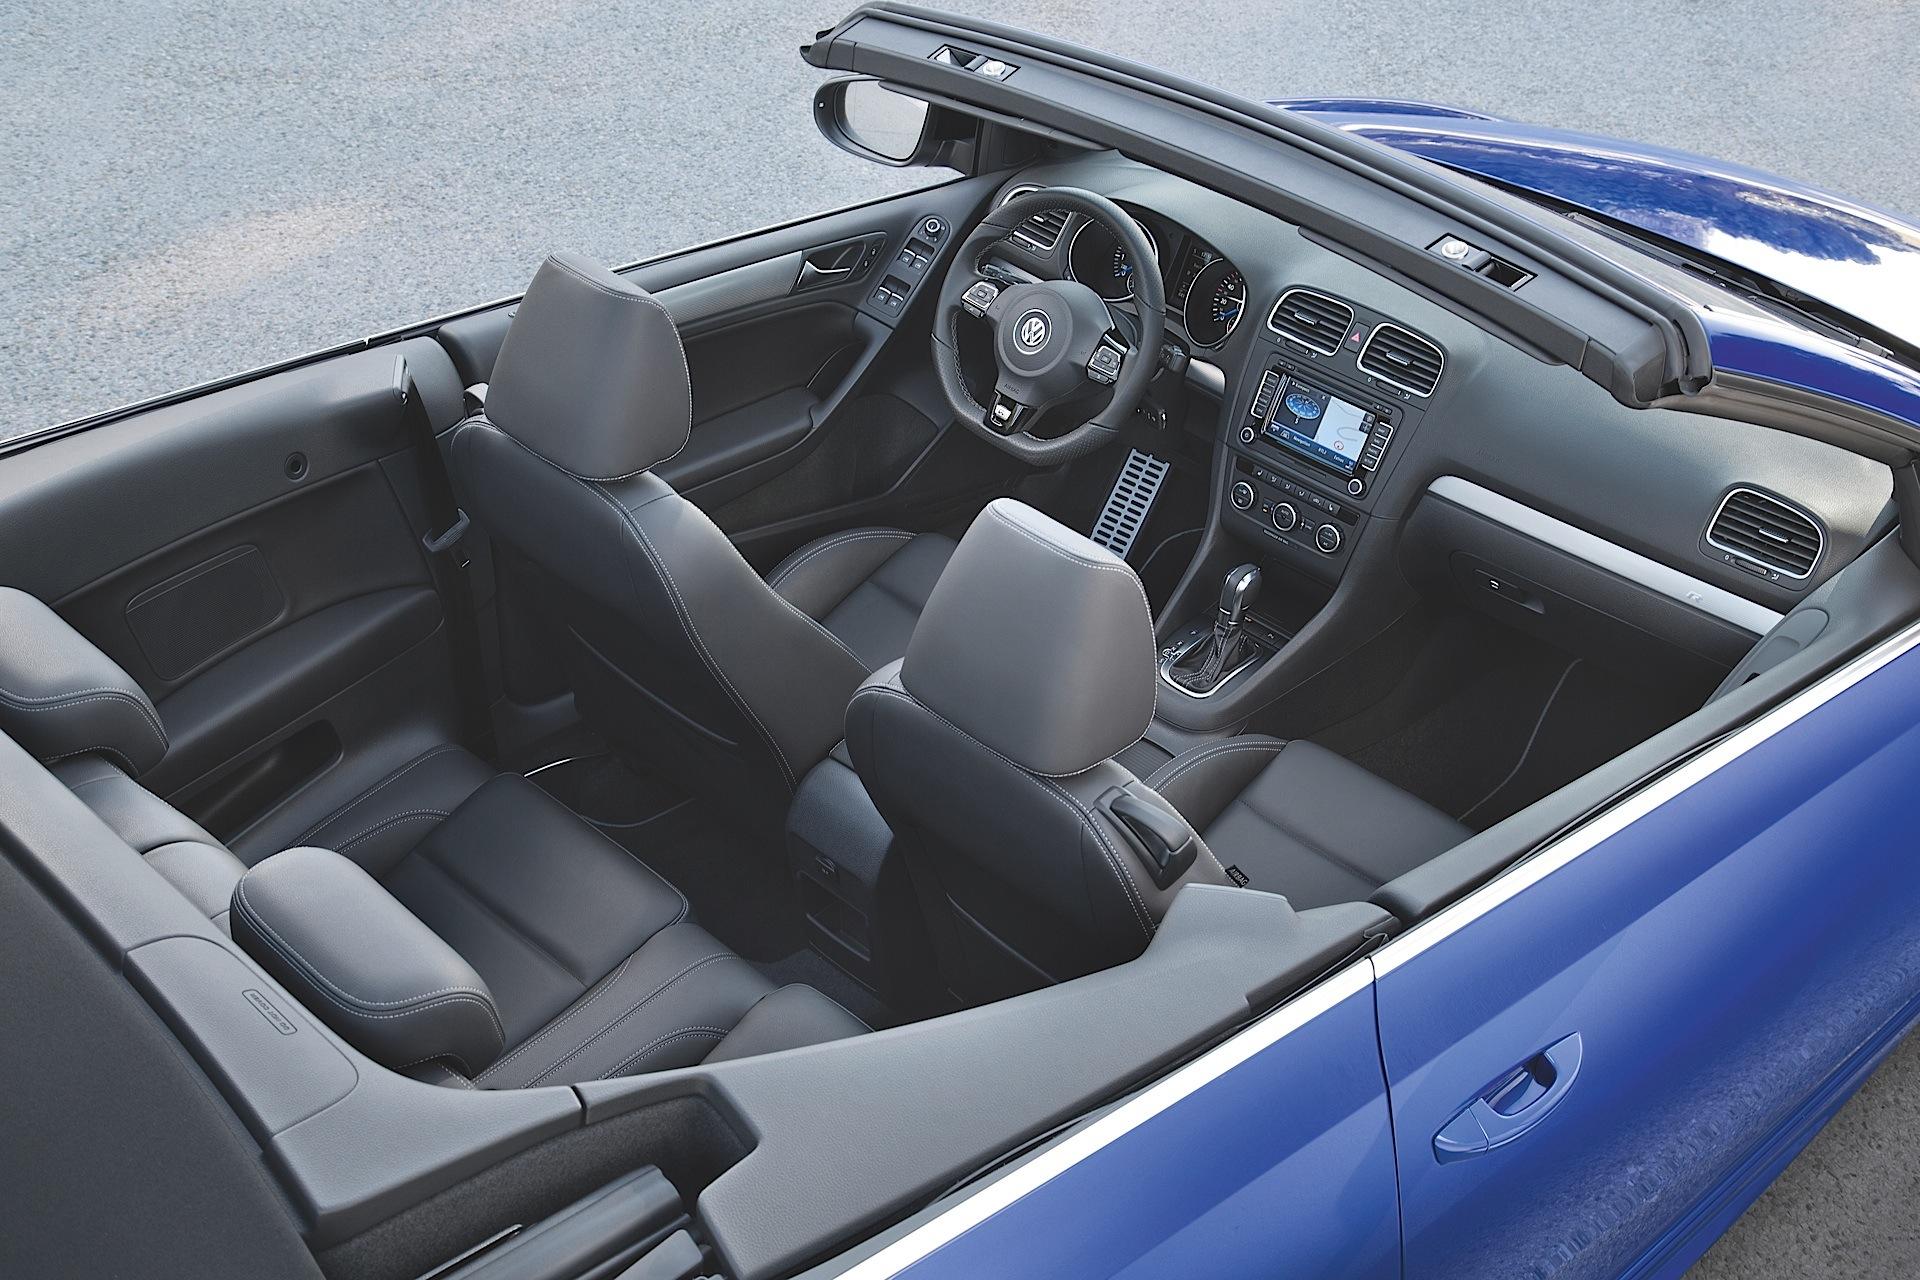 Volkswagen Golf 2013 Interior Interior Volkswagen Golf r